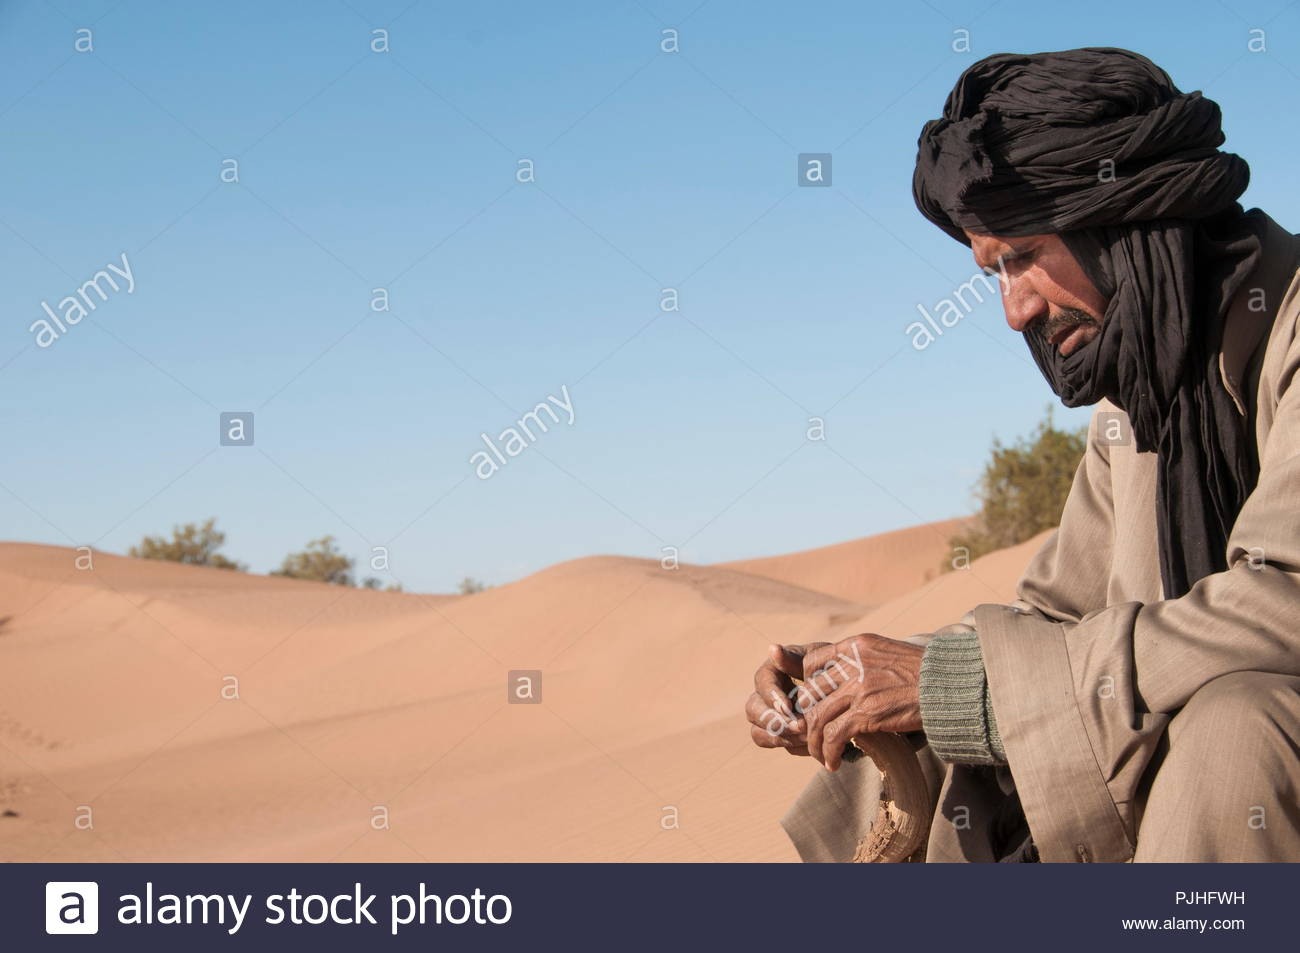 Morocco, Western Sahara, camel driver in the sand desert - Stock Image